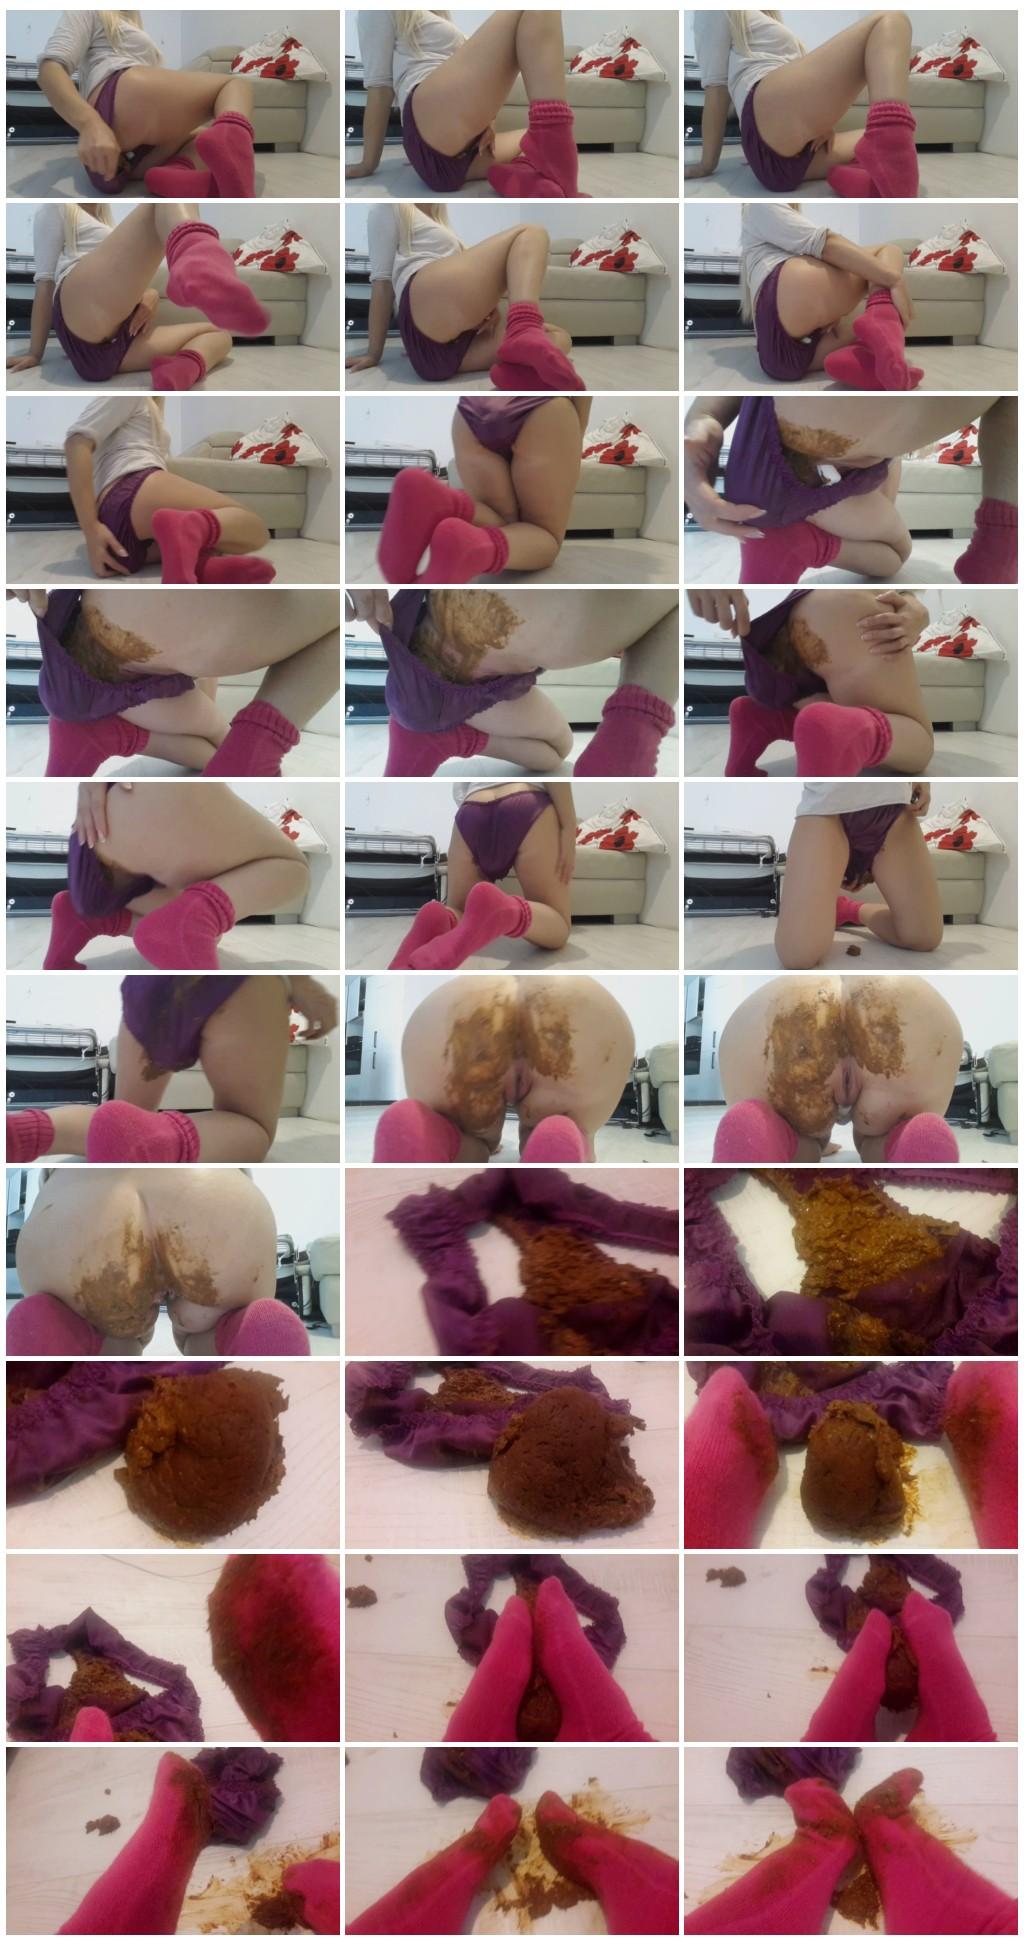 Thefartbabes Goddess Pink Socks Messy Scat solo shit defecation Shitty ass Masturbation Panty pooping Big Shit Smearing thumb - Thefartbabes - Goddess Pink Socks Messy [Scat solo, shit, defecation, Shitty ass, Masturbation, Panty pooping, Big Shit, Smearing]